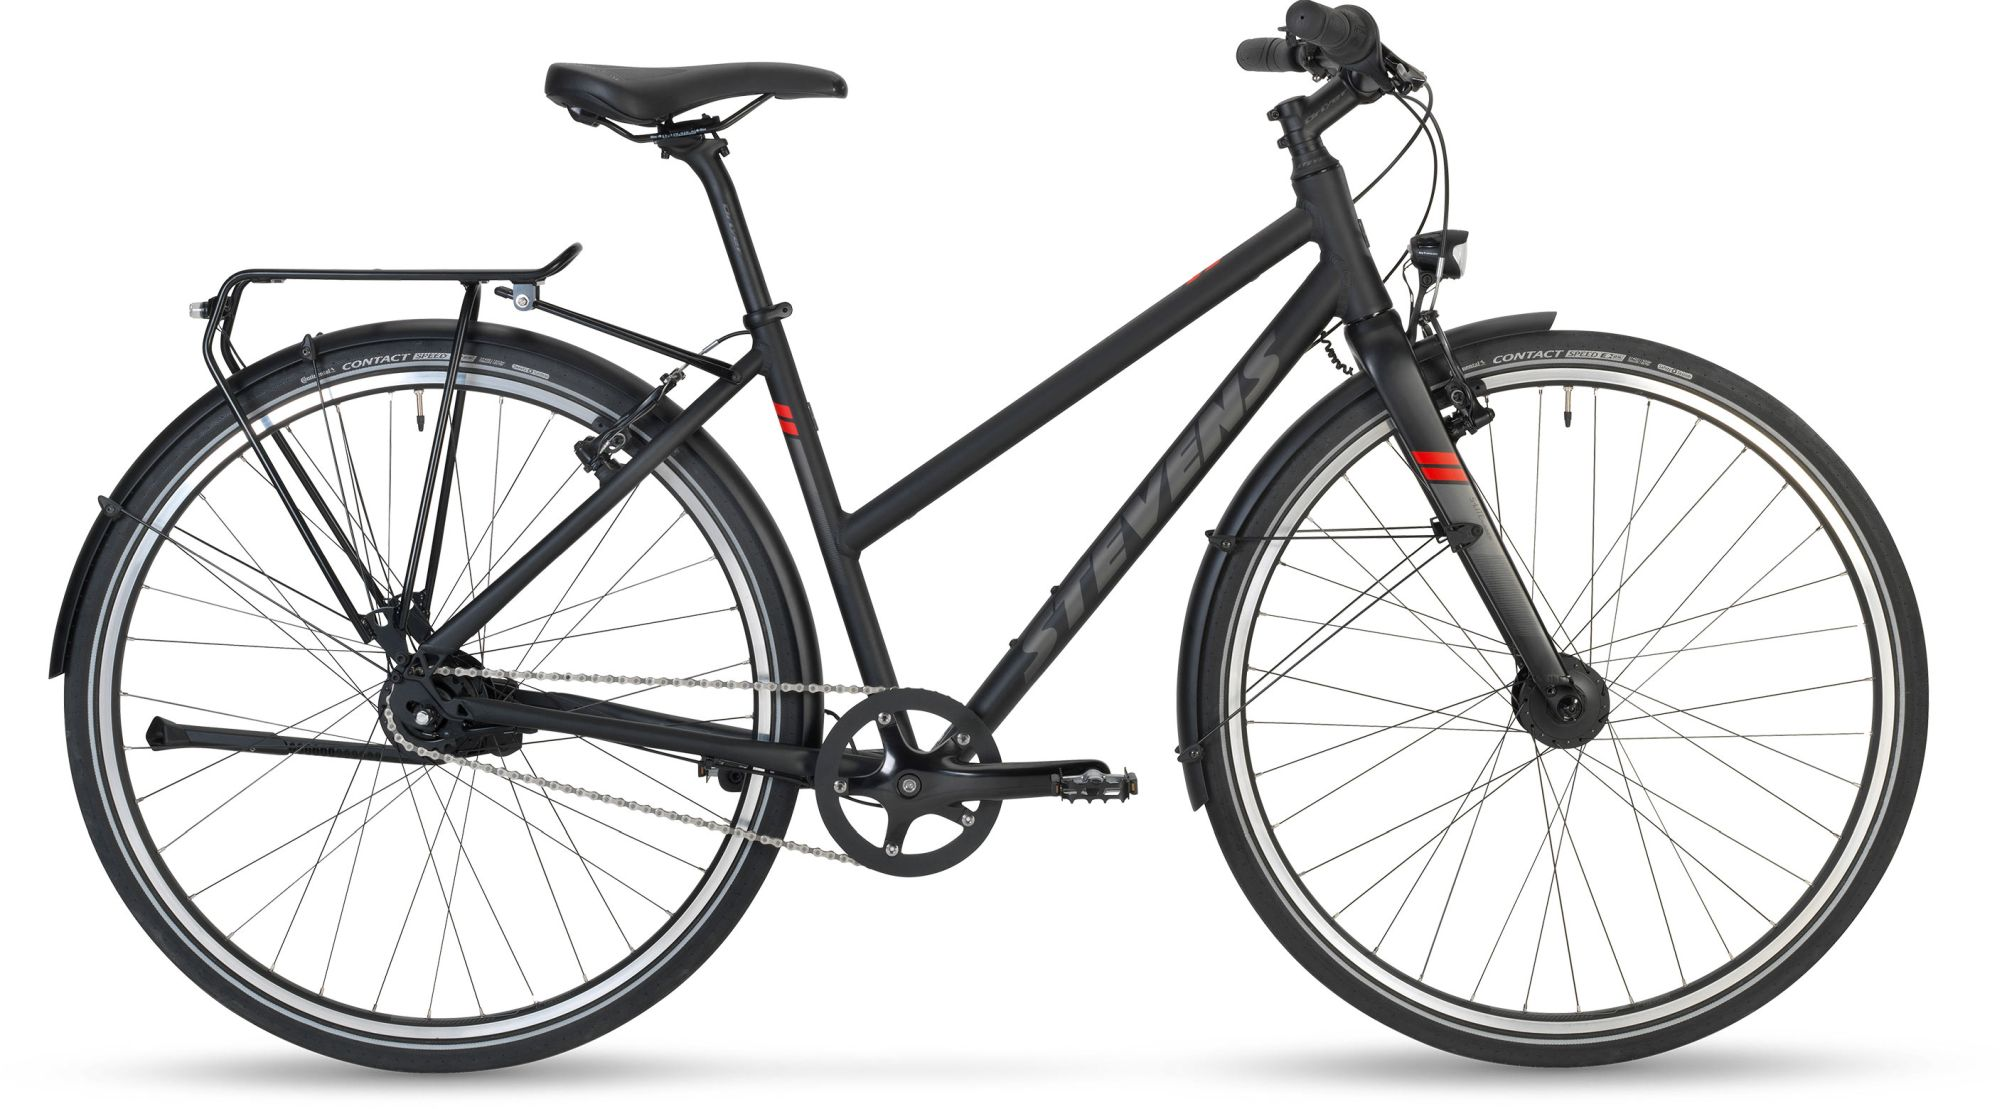 city-/tourenräder/Citybikes: STEVENS  City Flight Bike Bild Edition 8 Gang Nabenschaltung Damenfahrrad Trapez Modell 2020 28 Zoll 50 cm